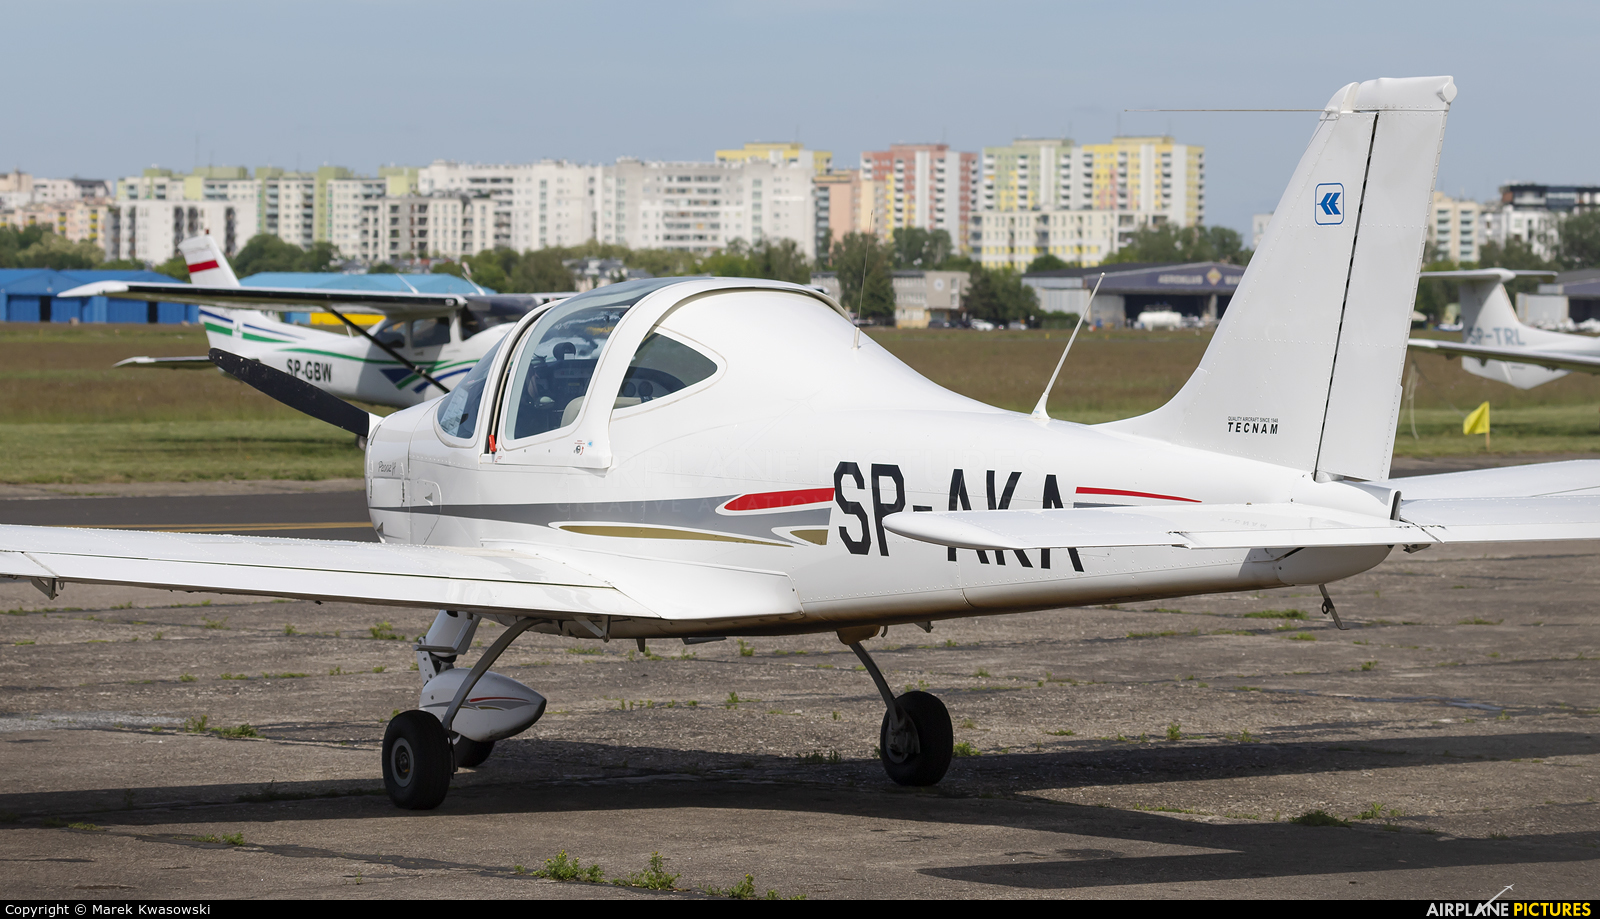 Aeroklub Kielecki SP-AKA aircraft at Warsaw - Babice